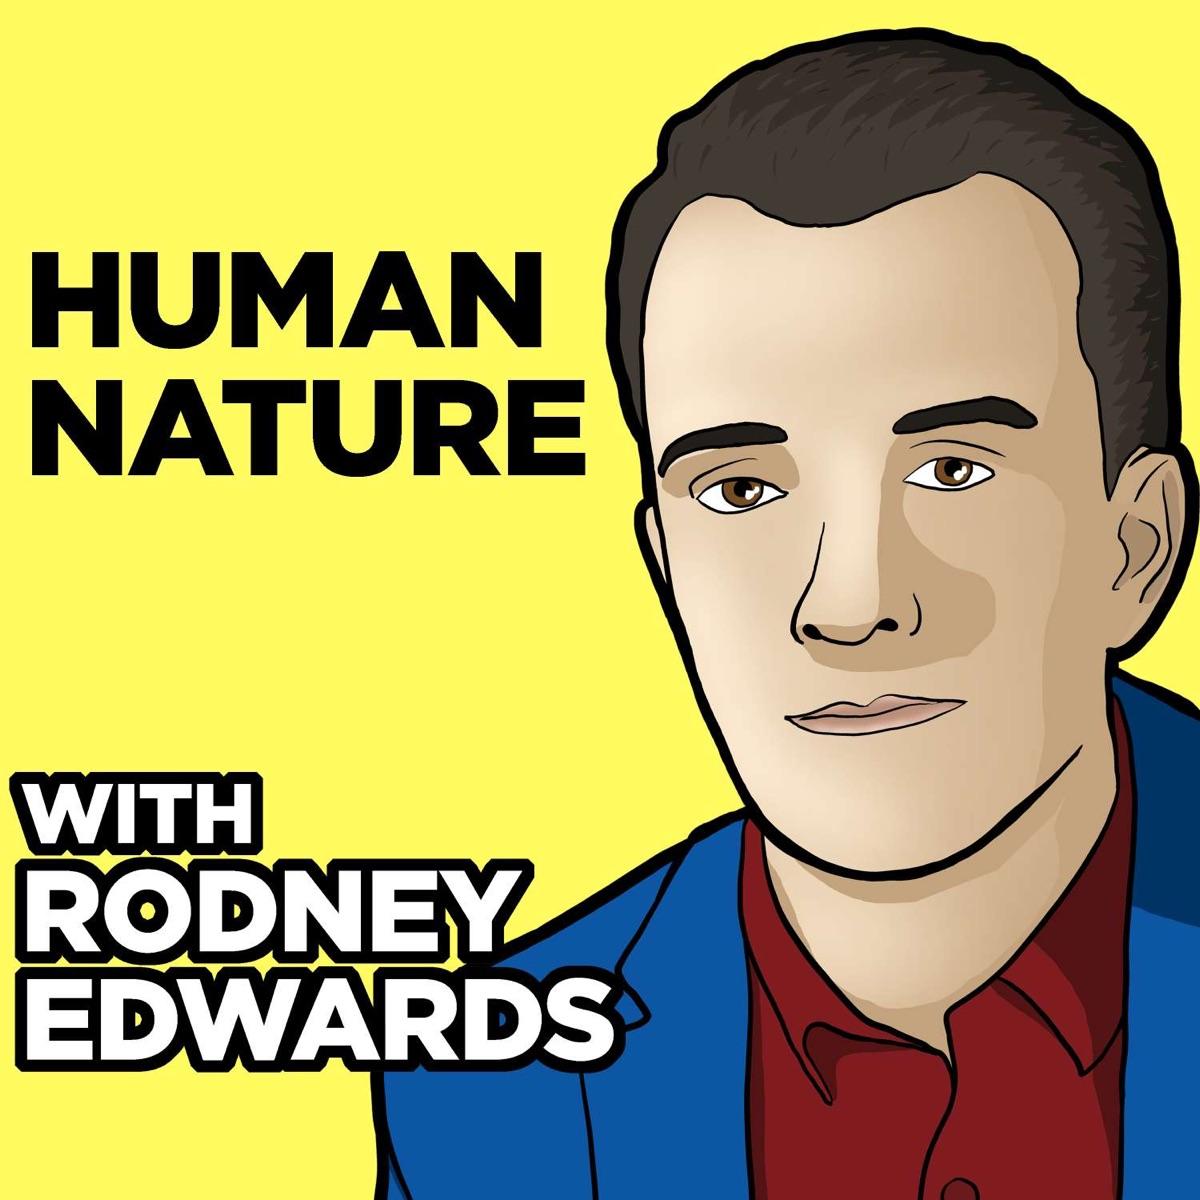 Human Nature with Rodney Edwards